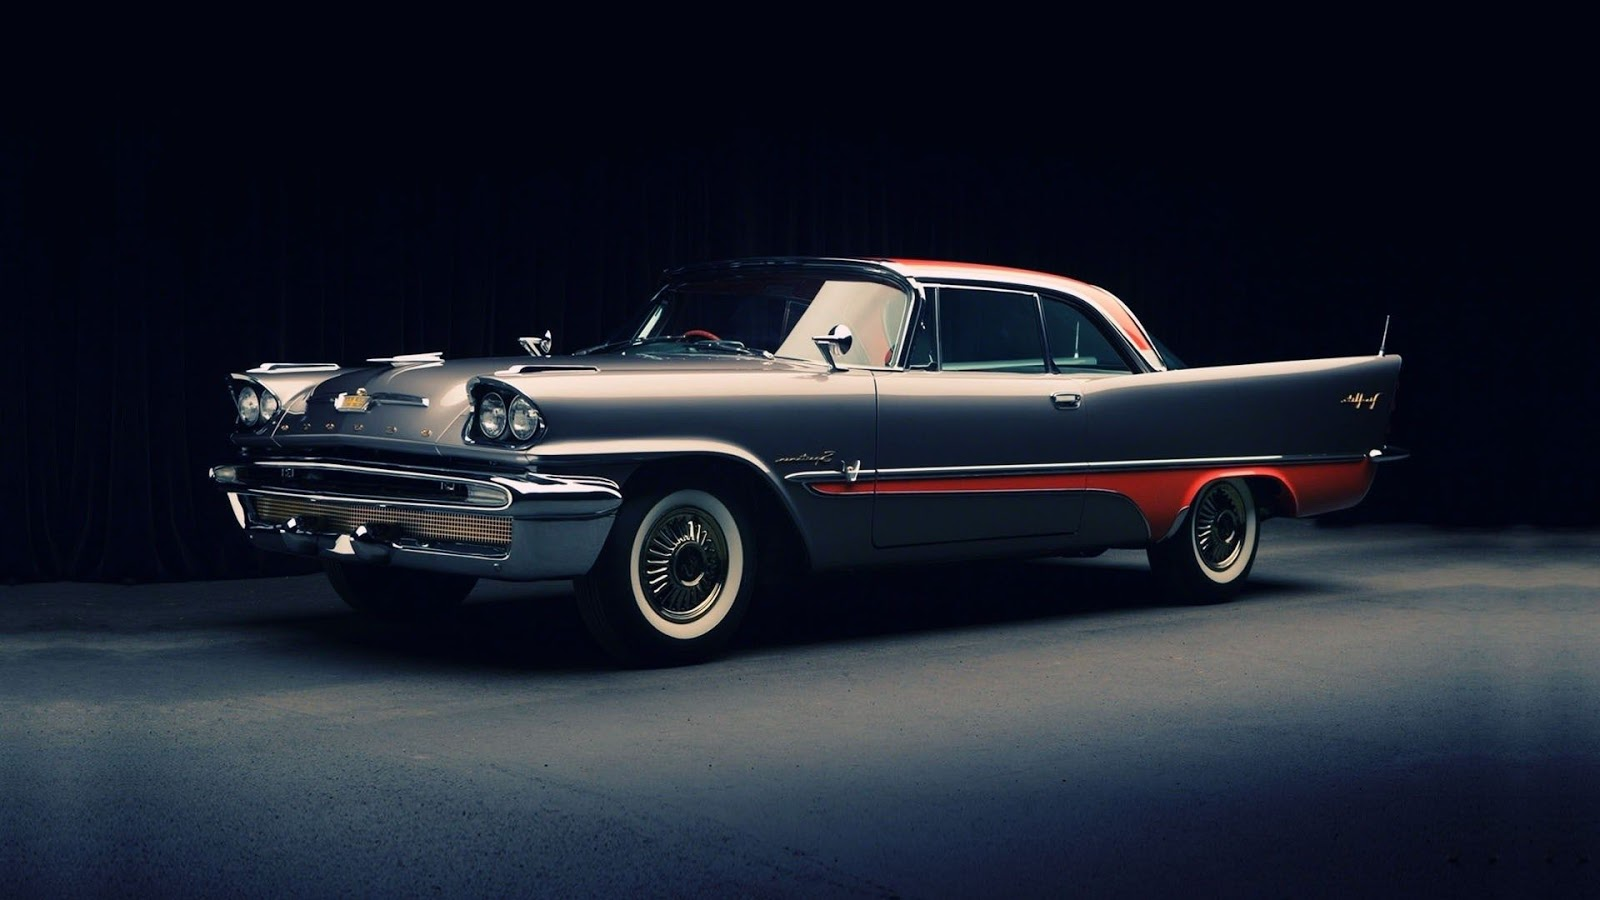 Classic Car Hd Images